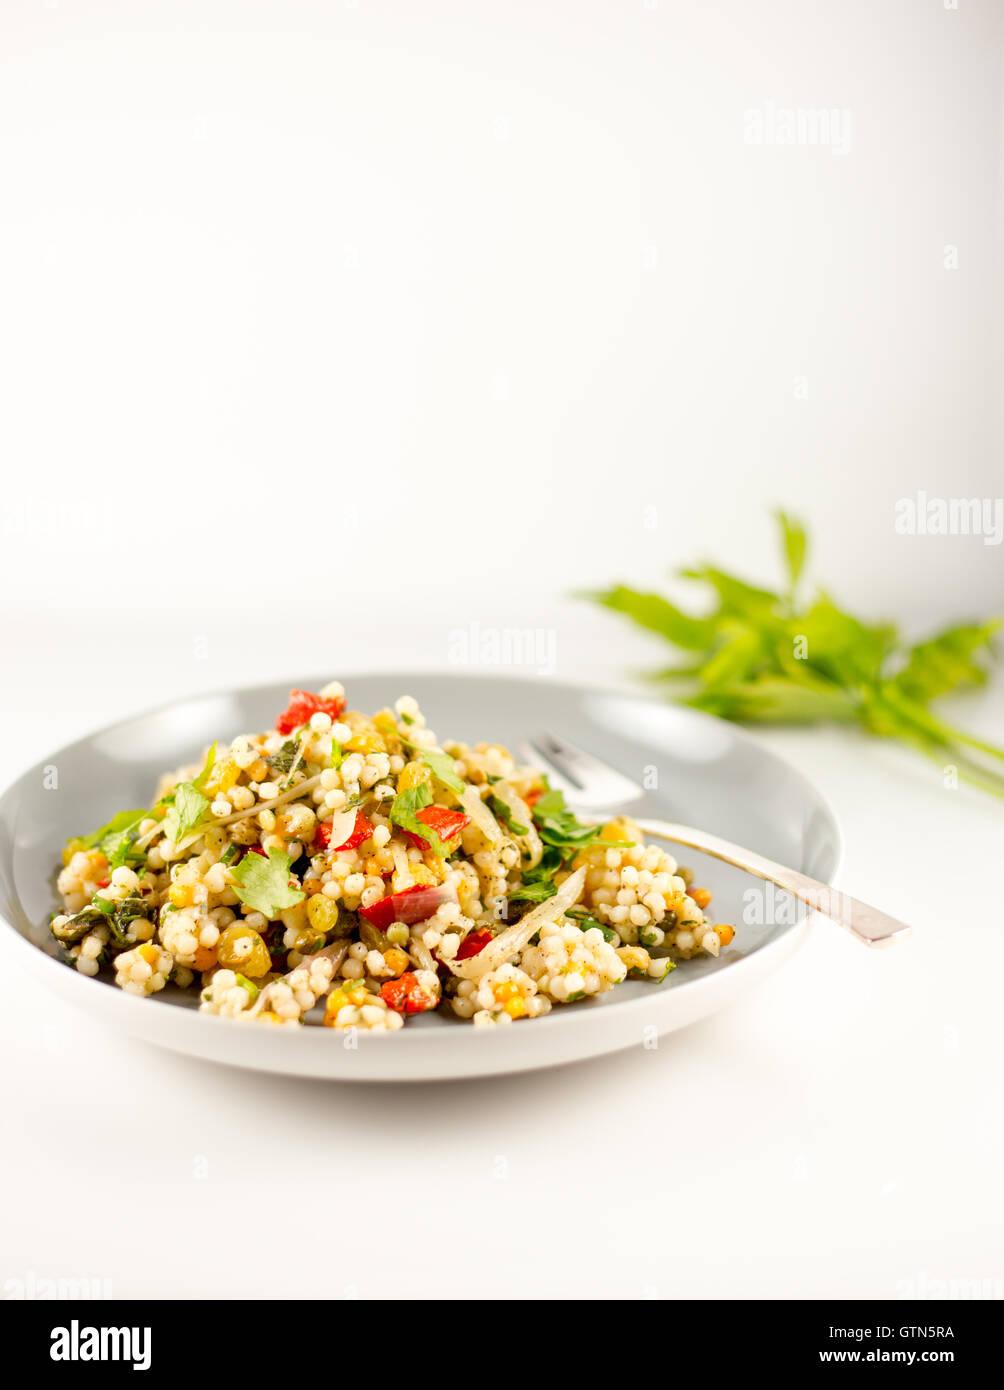 Vegetable couscous - Stock Image